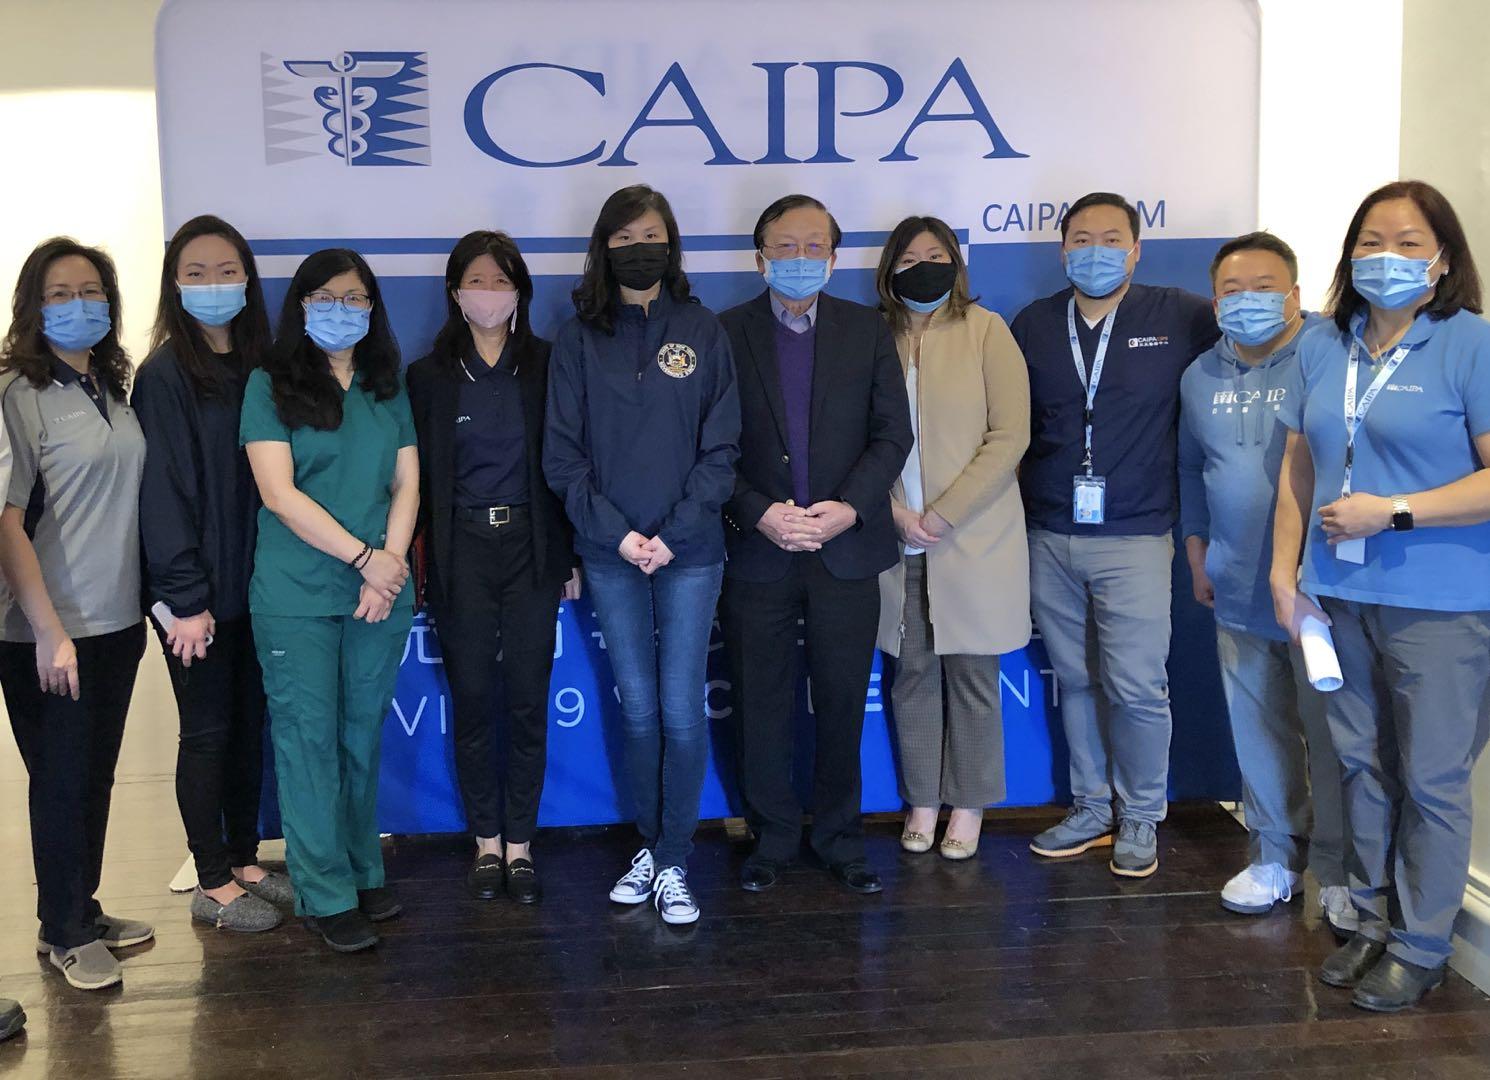 CAIPA Pop-Up Vaccine Site